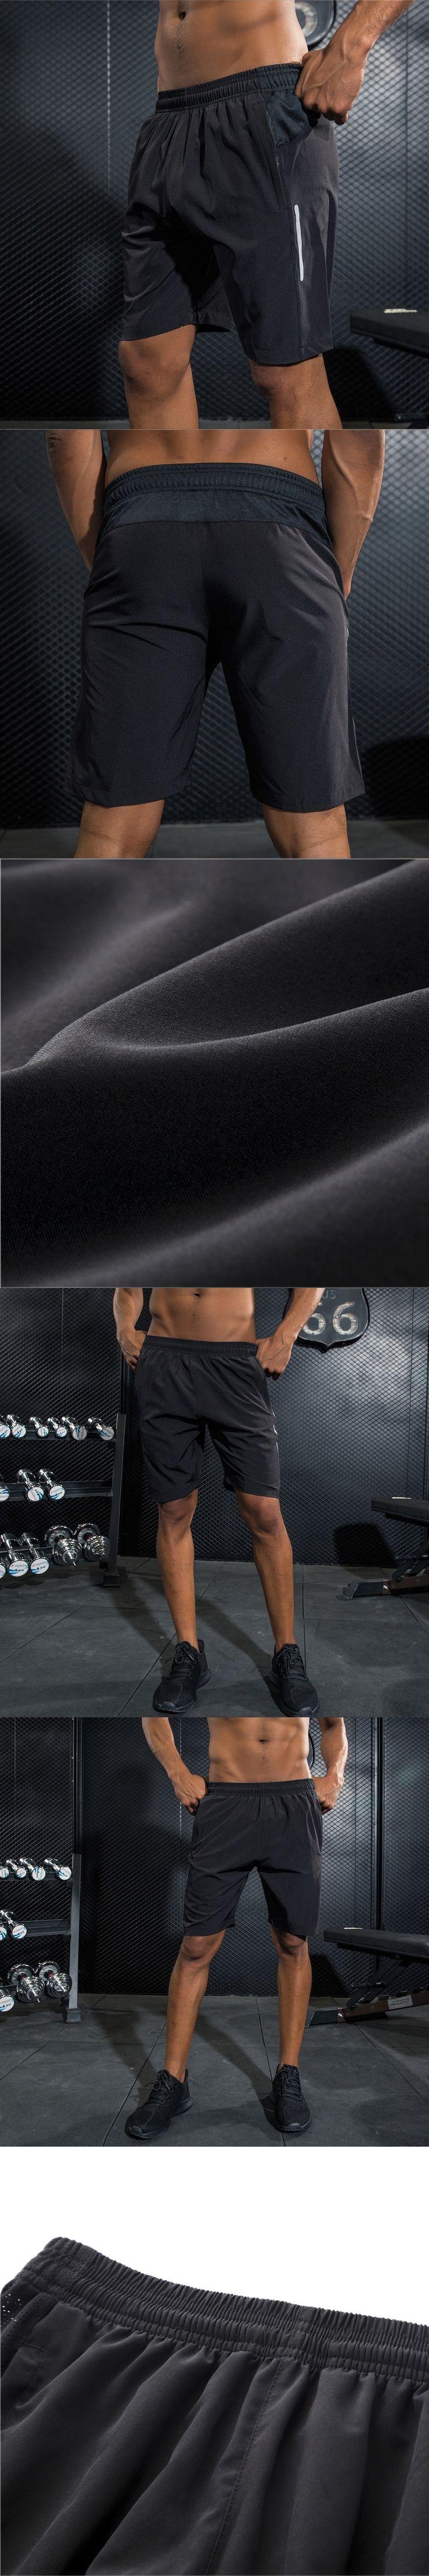 2017 New Men shorts summer athletics short  Clothing sweat short joggers man sporting shorts homme free shipping